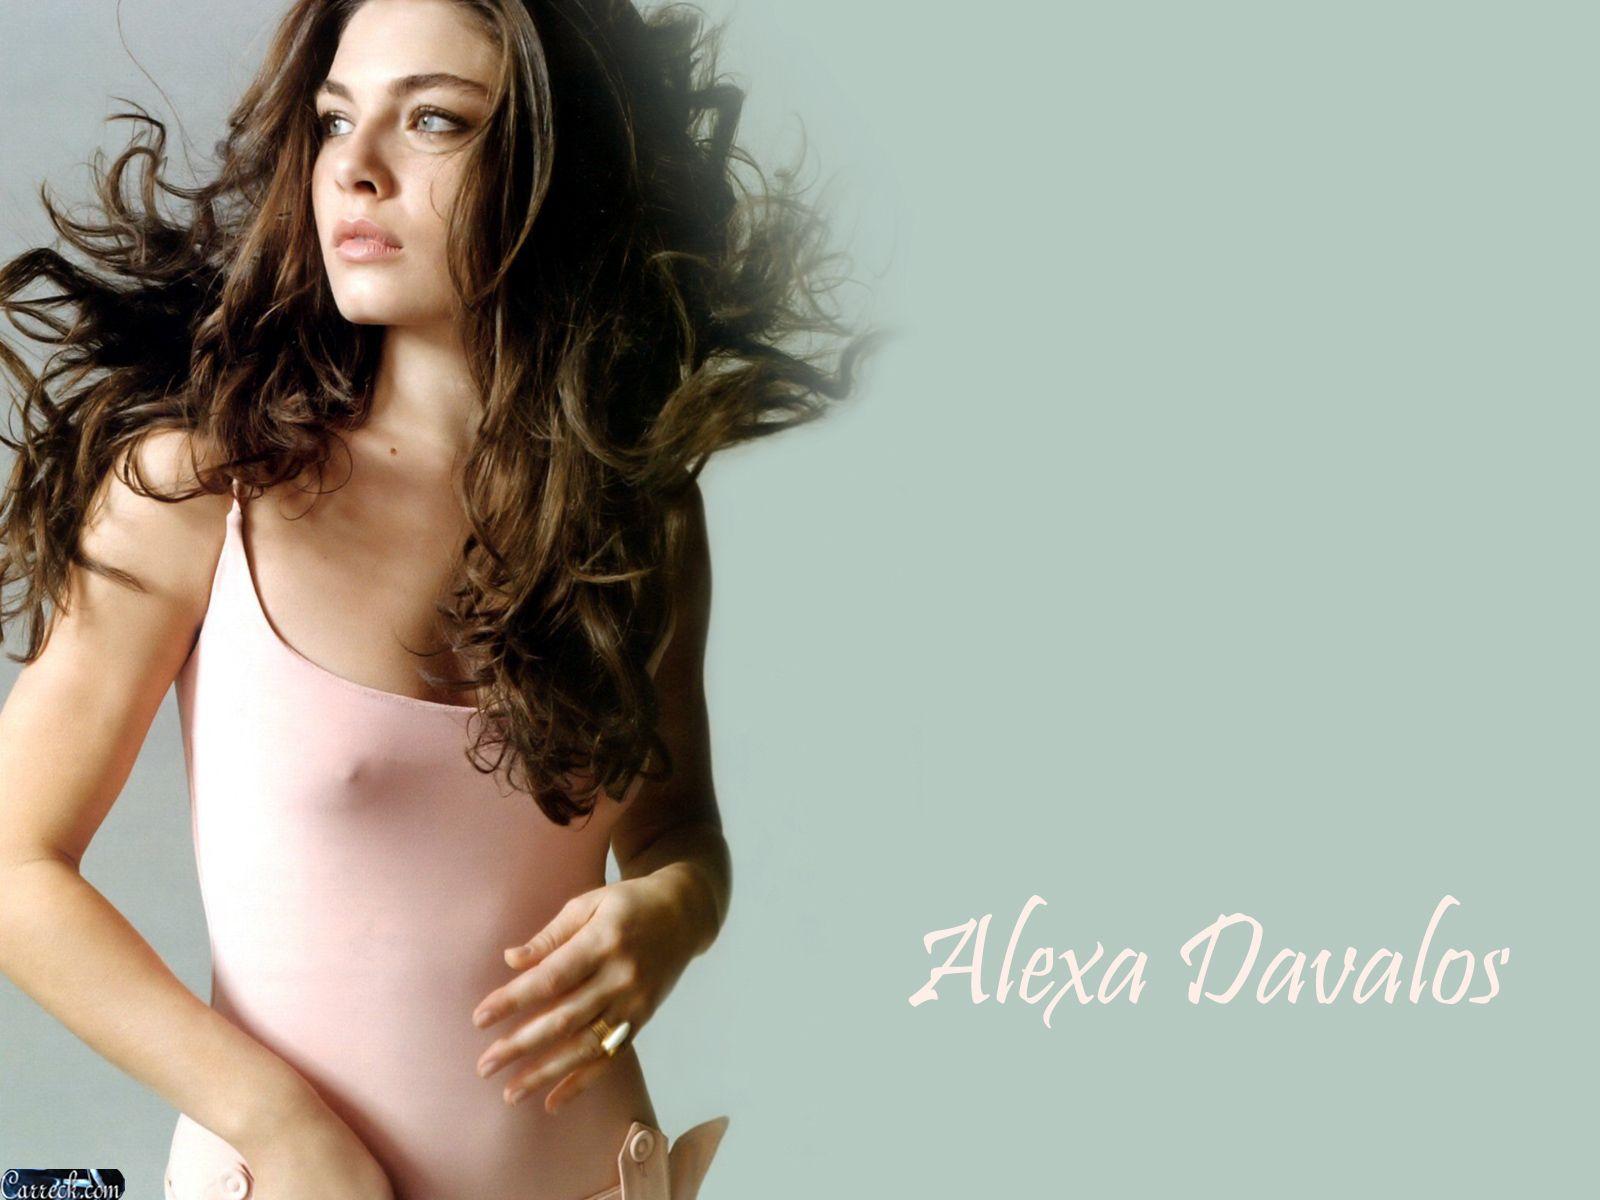 Alexa Davalos Bikini